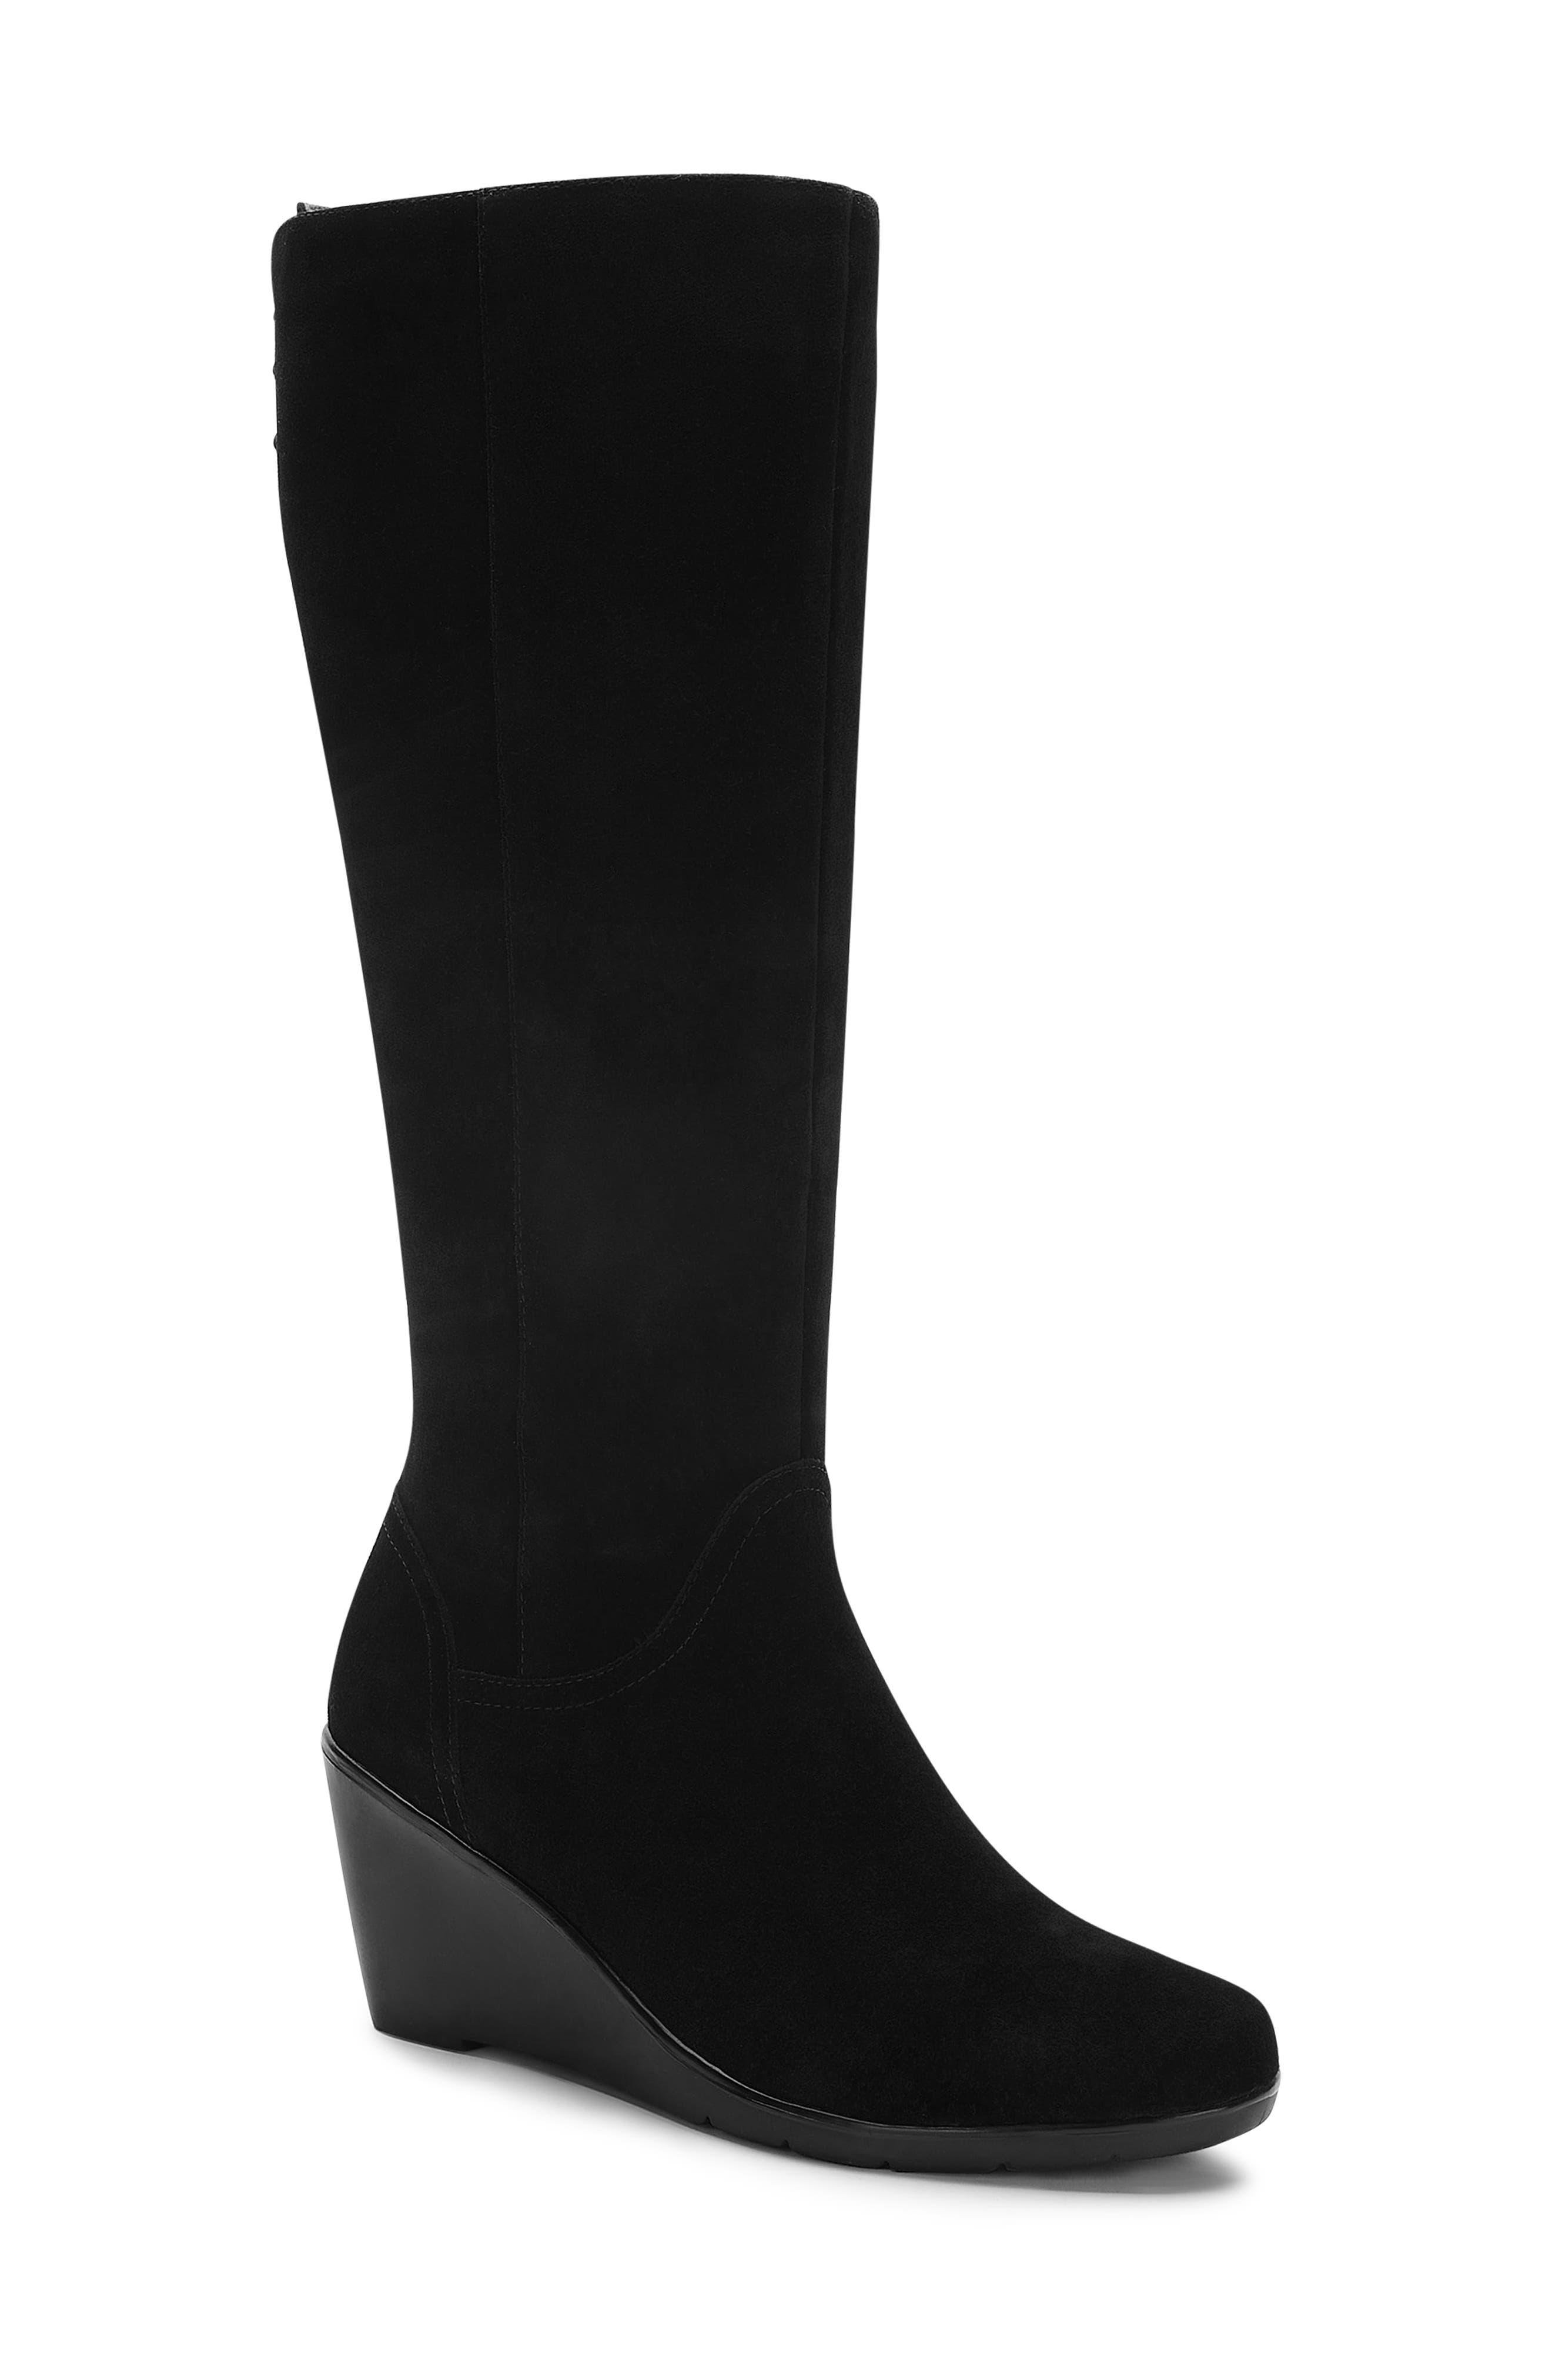 Larissa Waterproof Wedge Knee High Boot,                             Main thumbnail 1, color,                             BLACK SUEDE